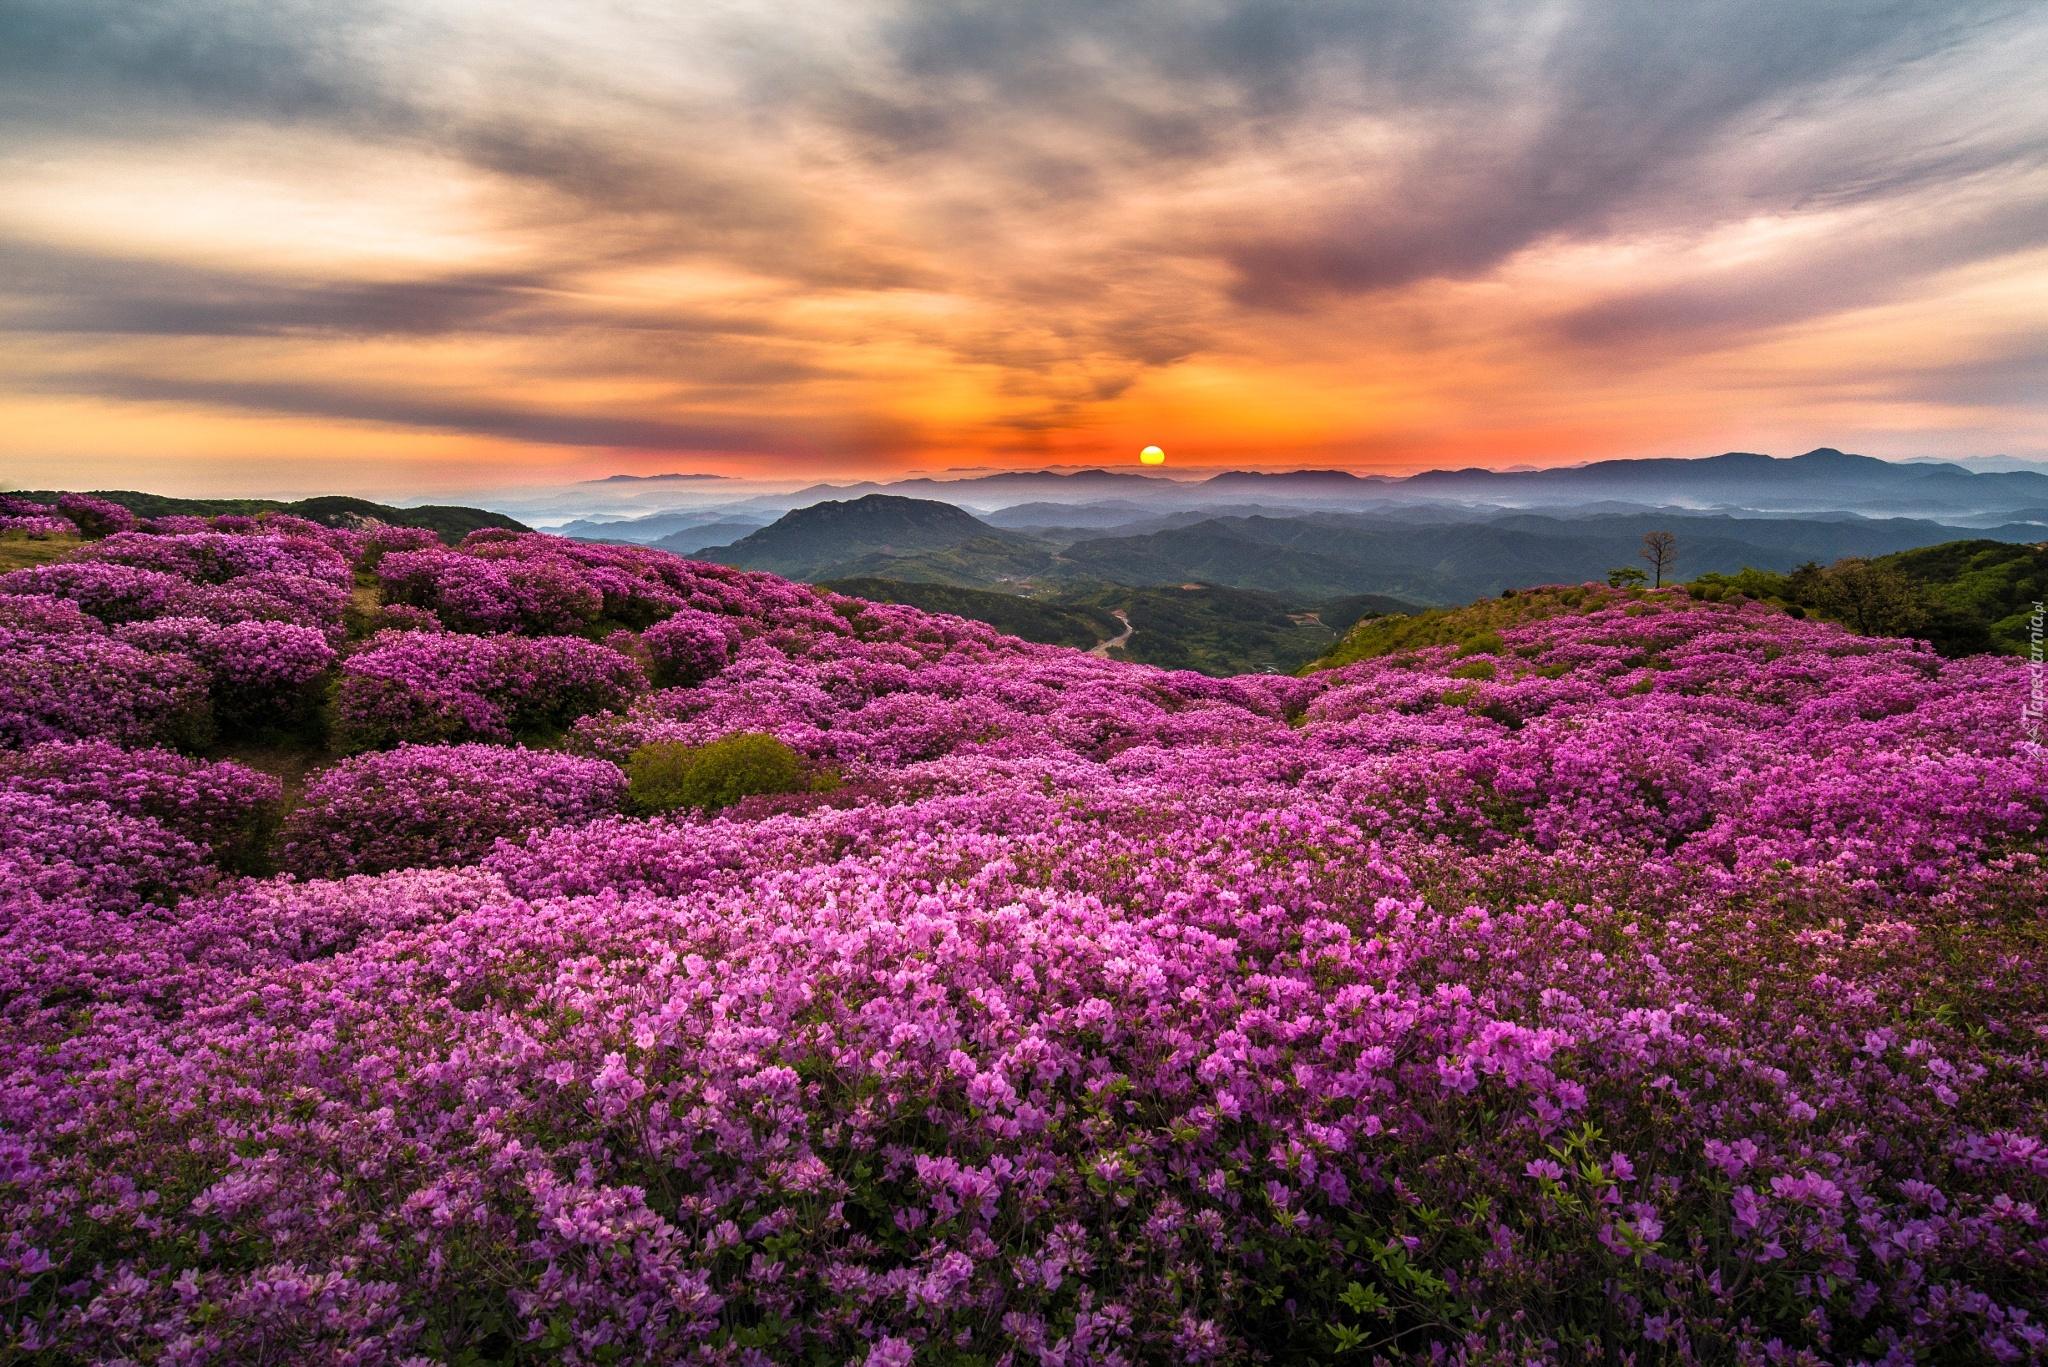 Good Morning Beautiful Korean : Kwiecista Łąka góry wschód słońca mgła